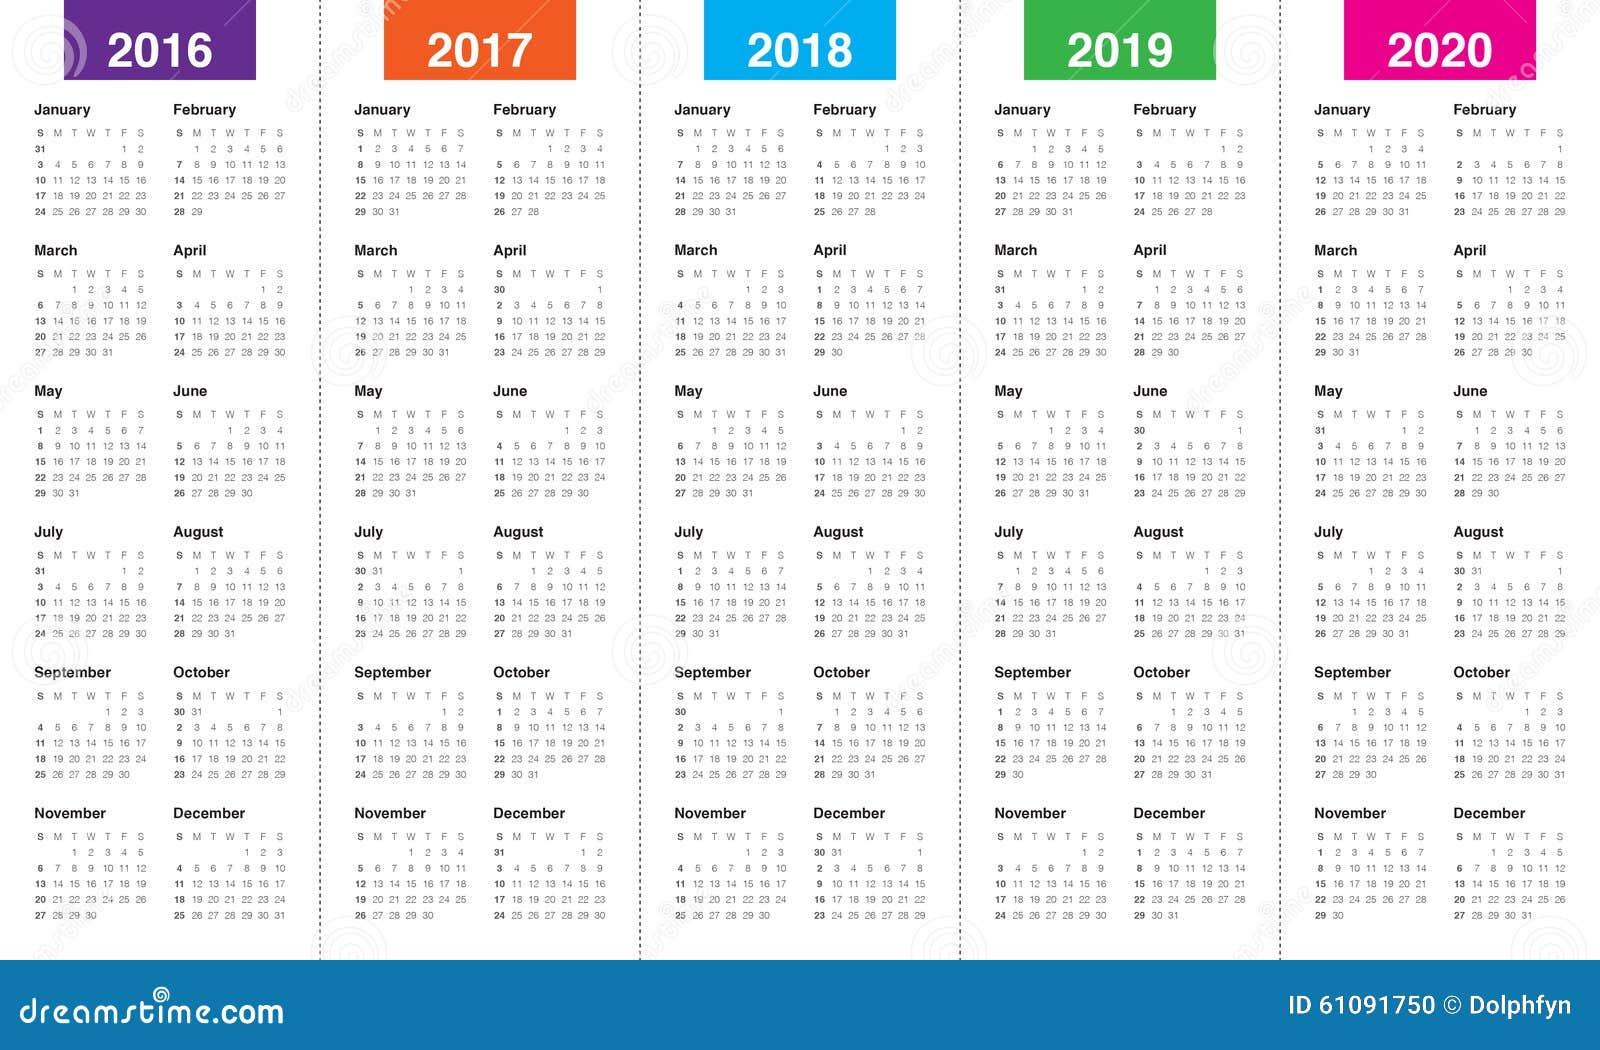 kalender 2016 2017 2018 2019 2020 vektor abbildung bild. Black Bedroom Furniture Sets. Home Design Ideas